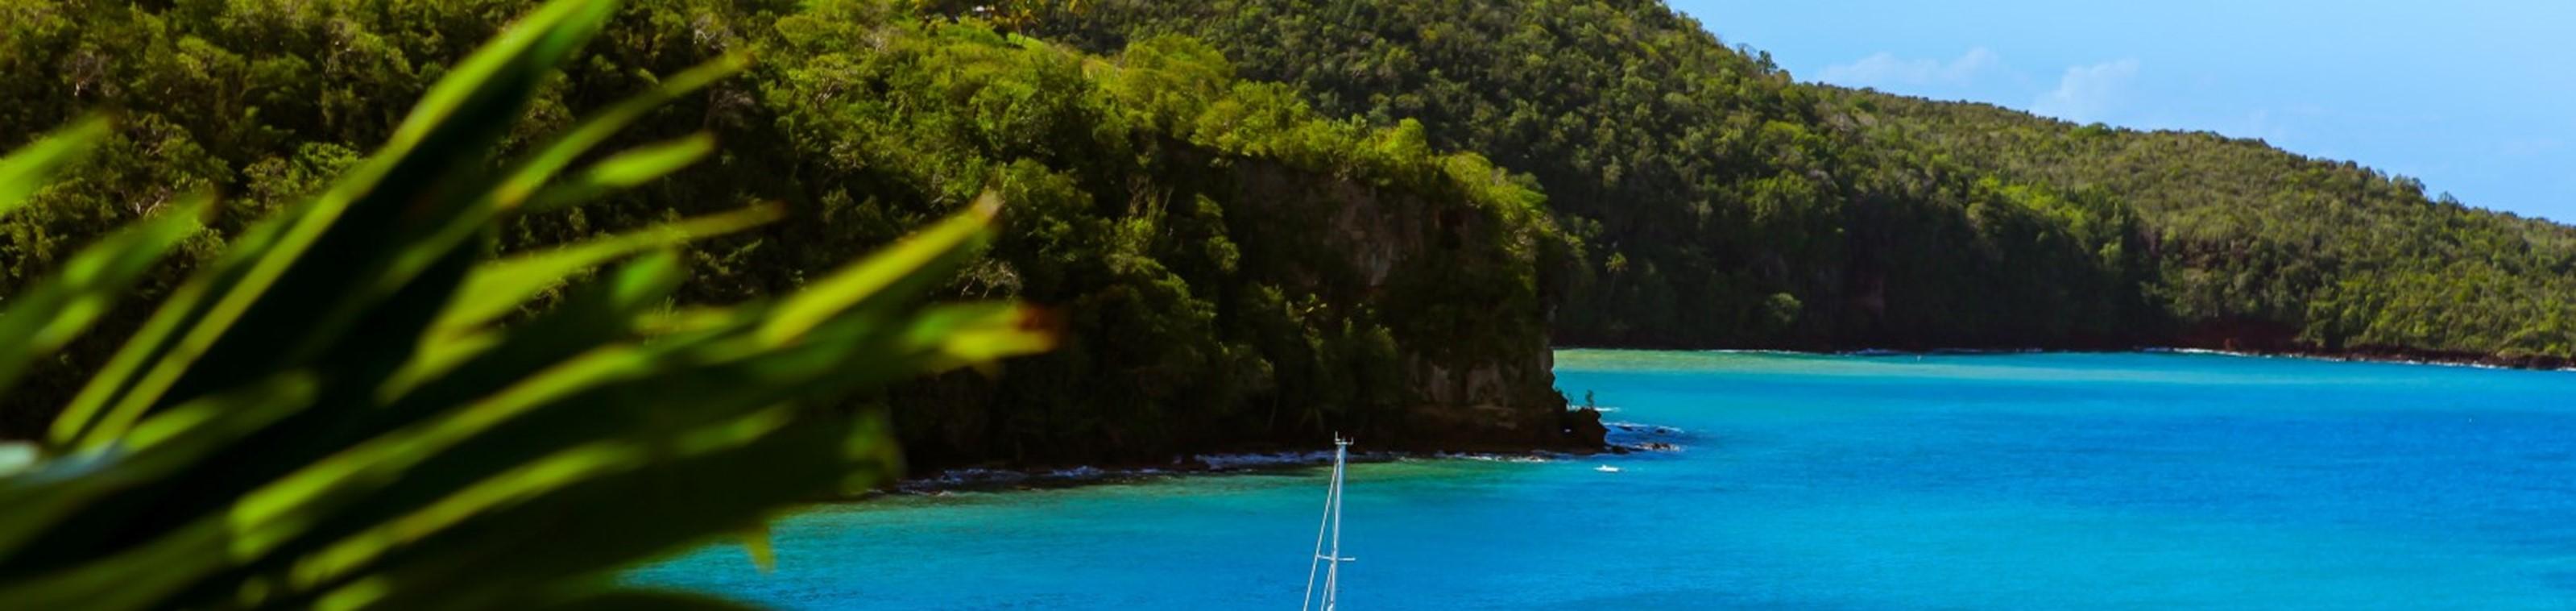 Luxecruise Caraïben met de Seabourn Odyssey